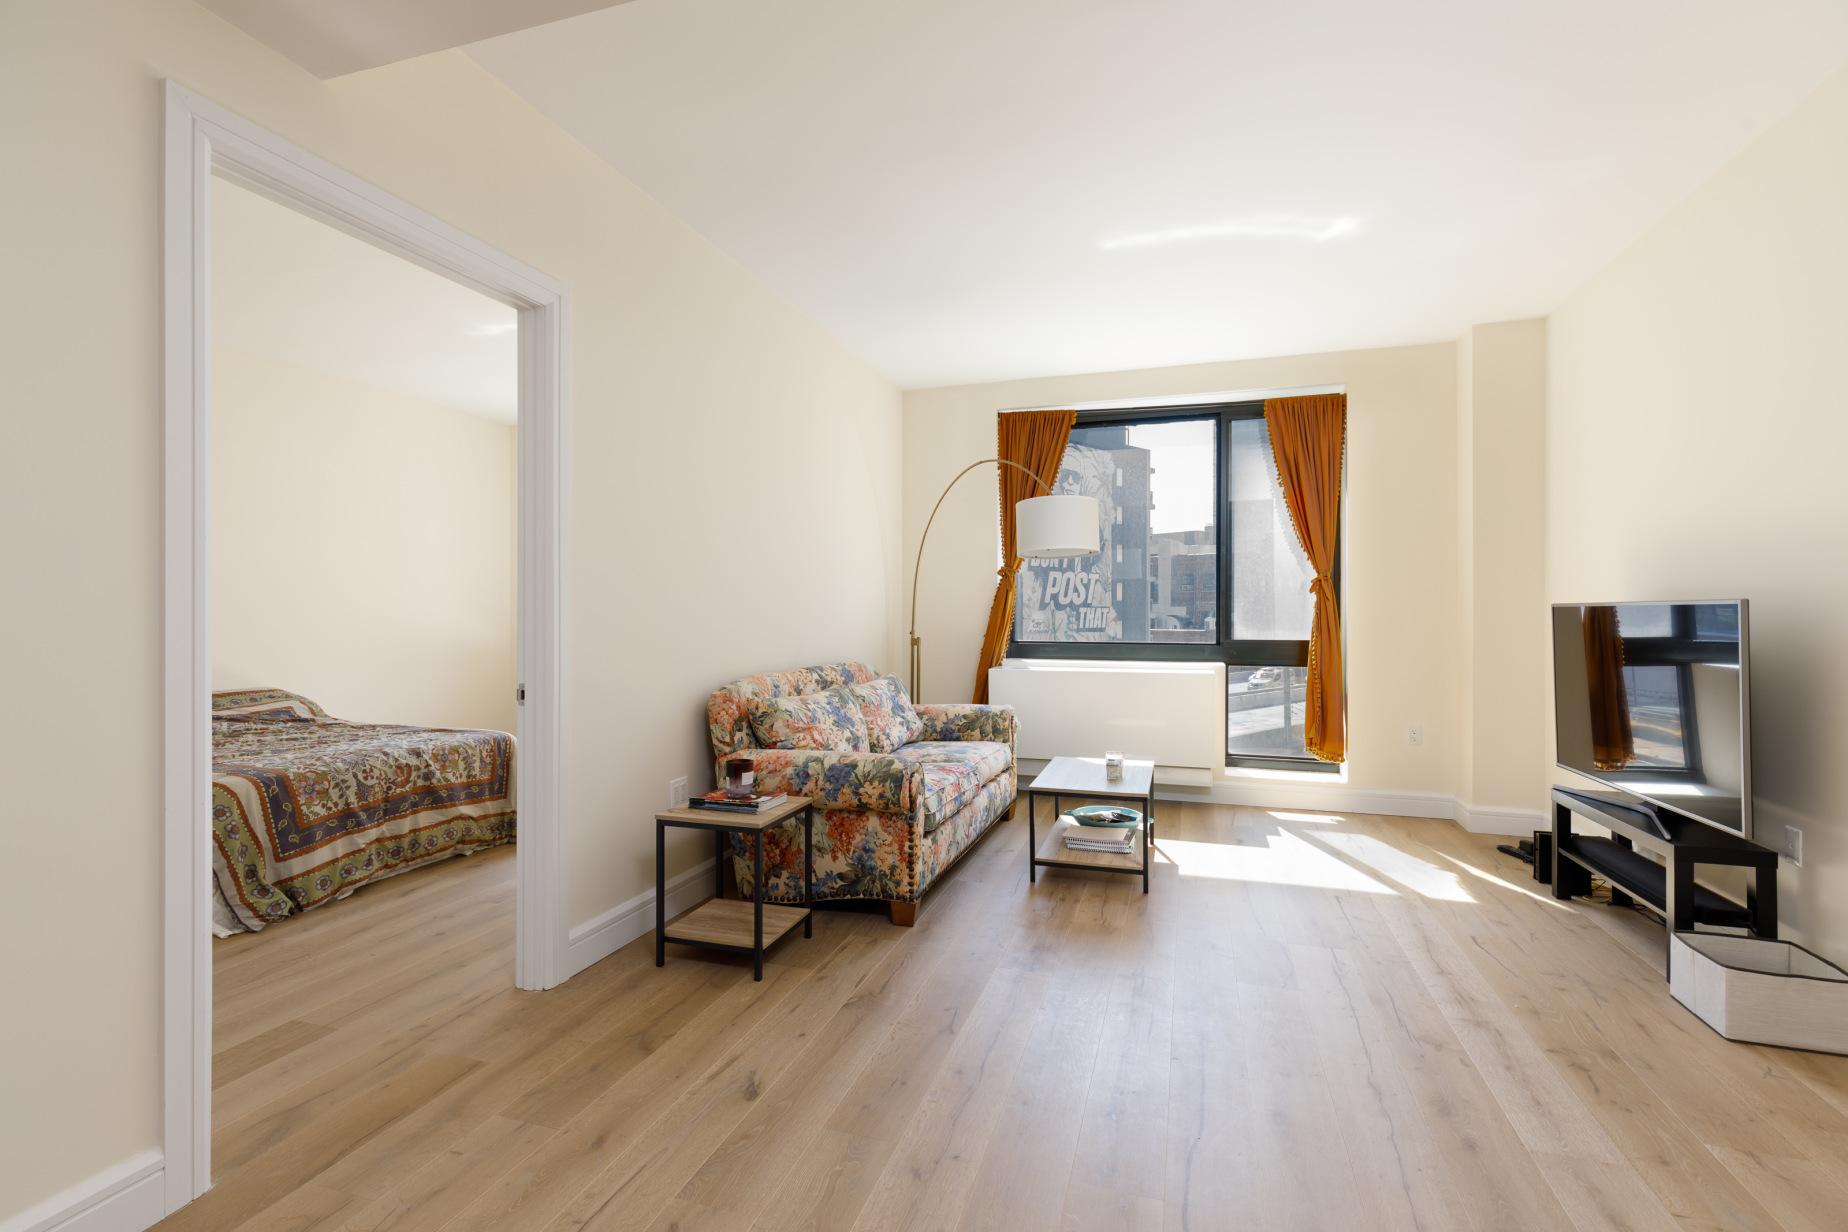 25-21 43rd Avenue, Apt 410, Queens, New York 11101